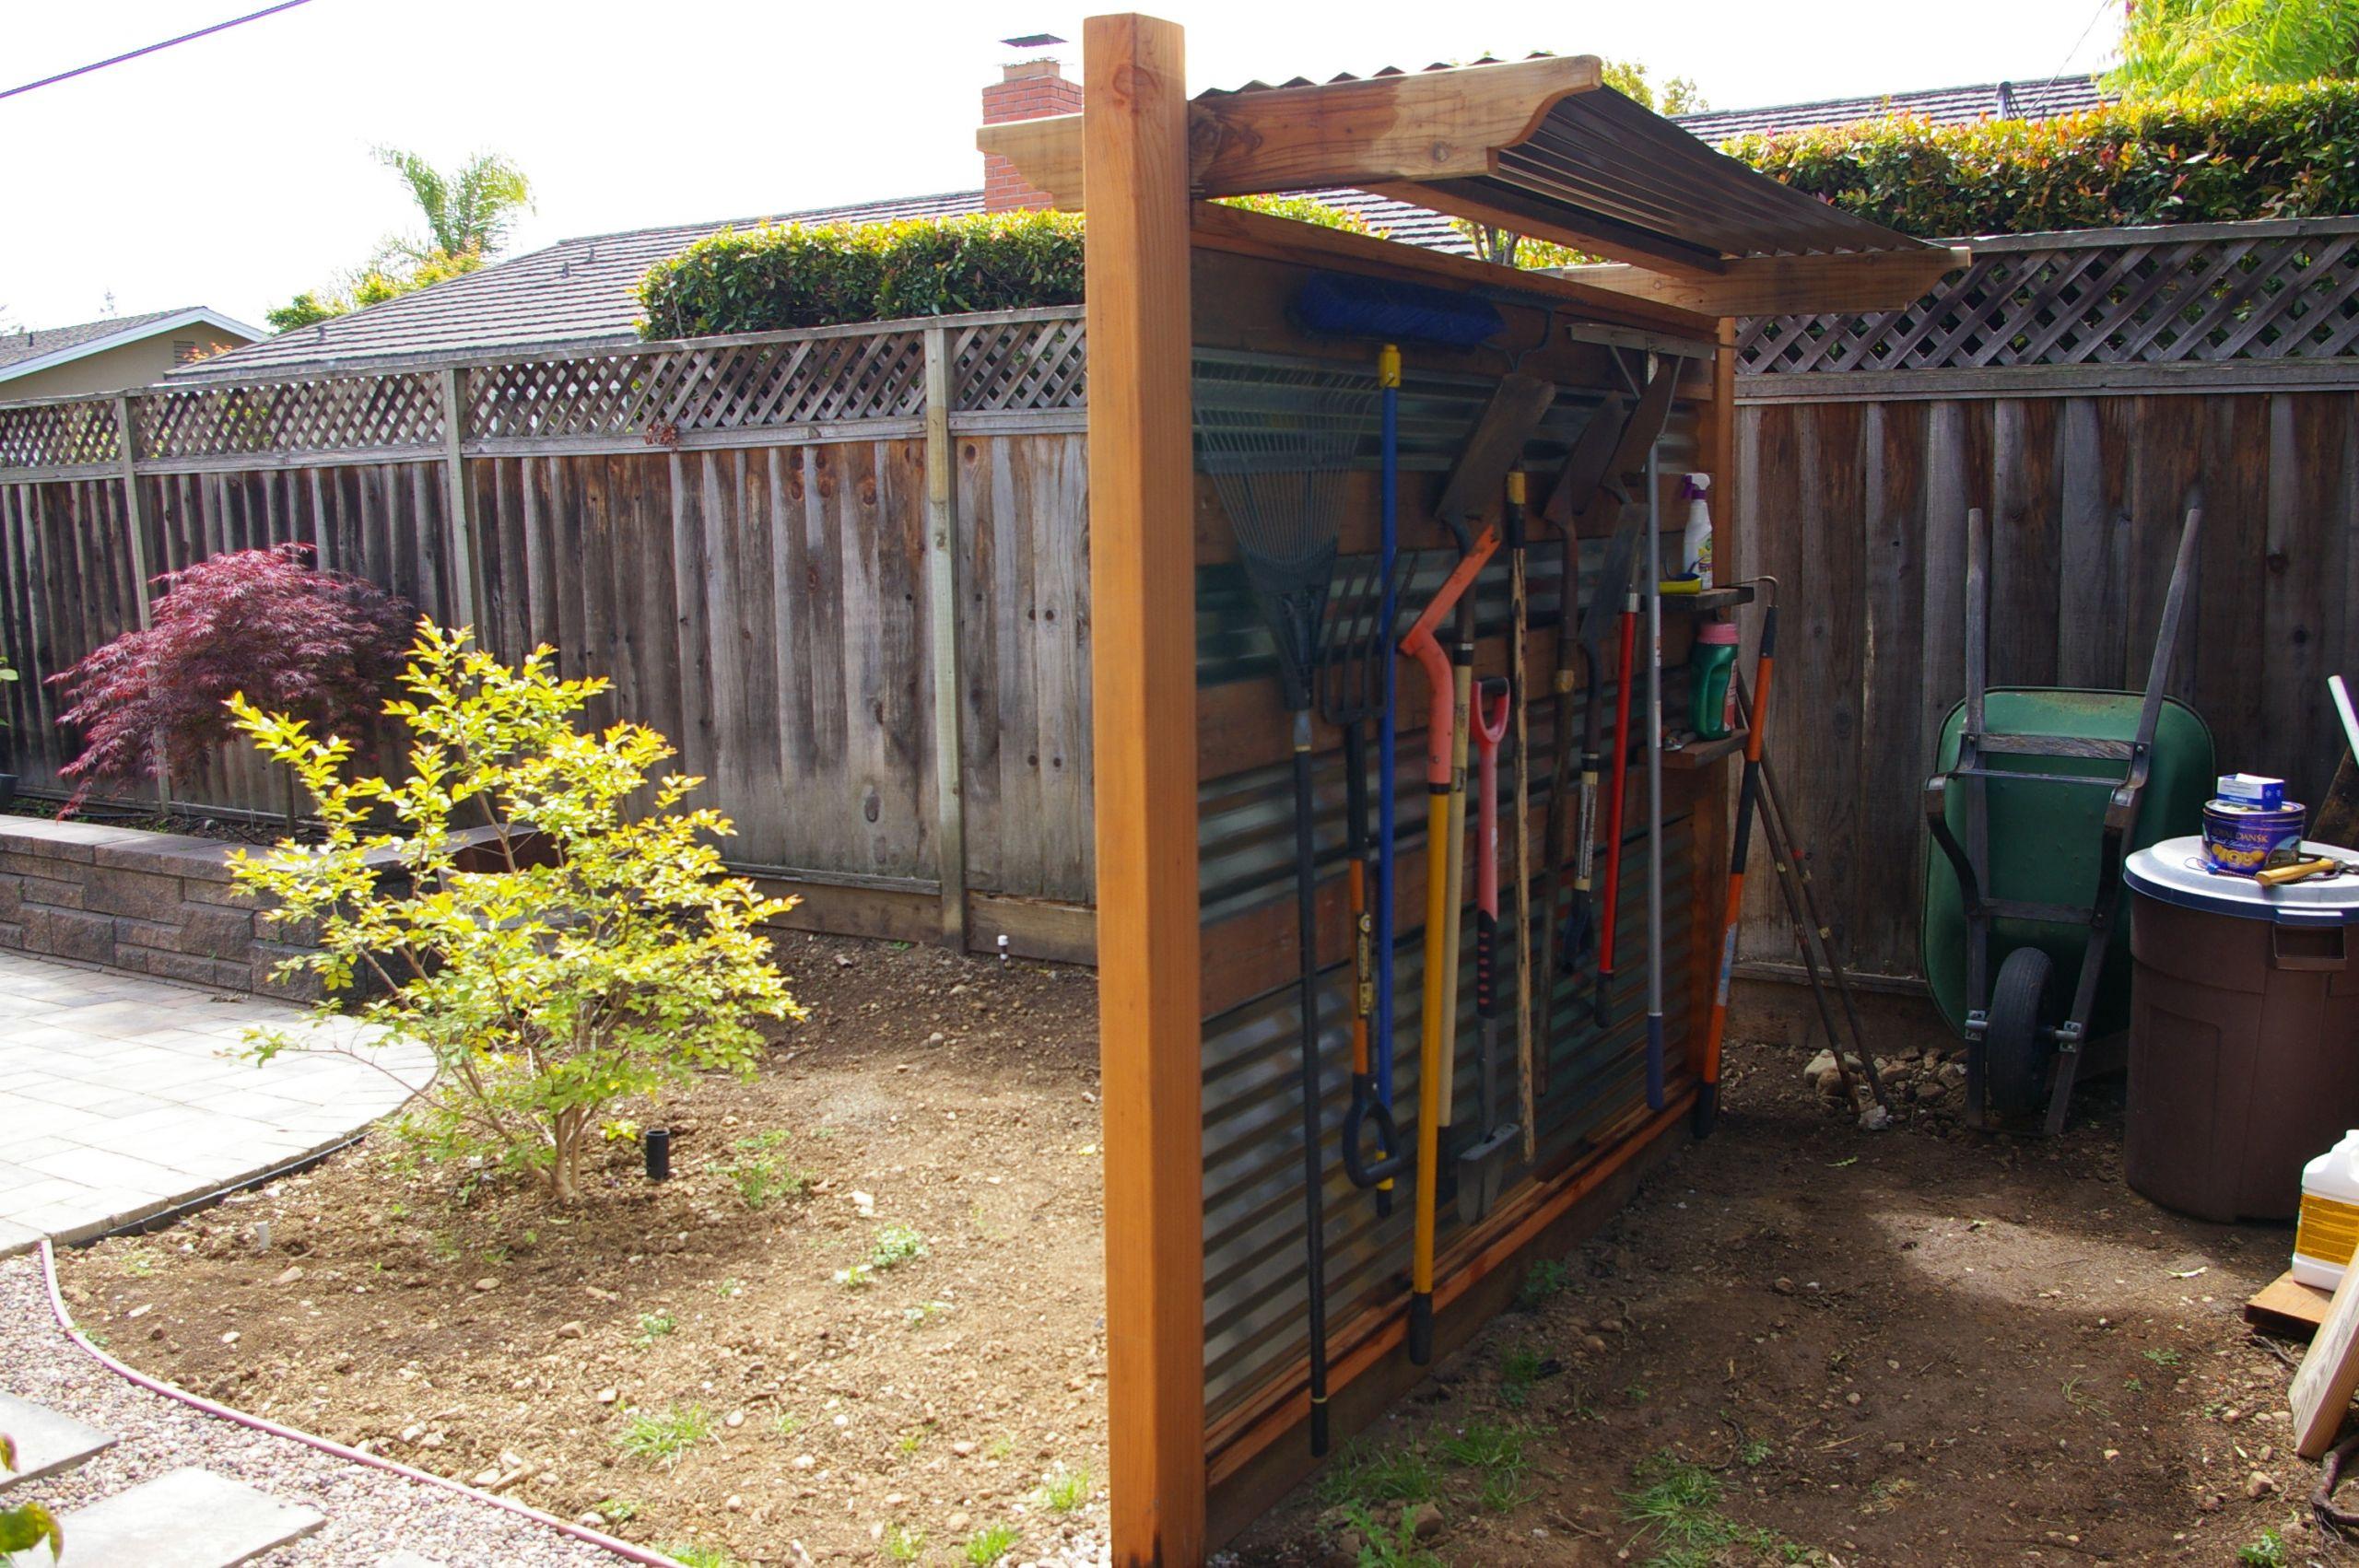 Backyard Design Tools  Backyard Landscaping Corrugated Metal and Redwood Tool